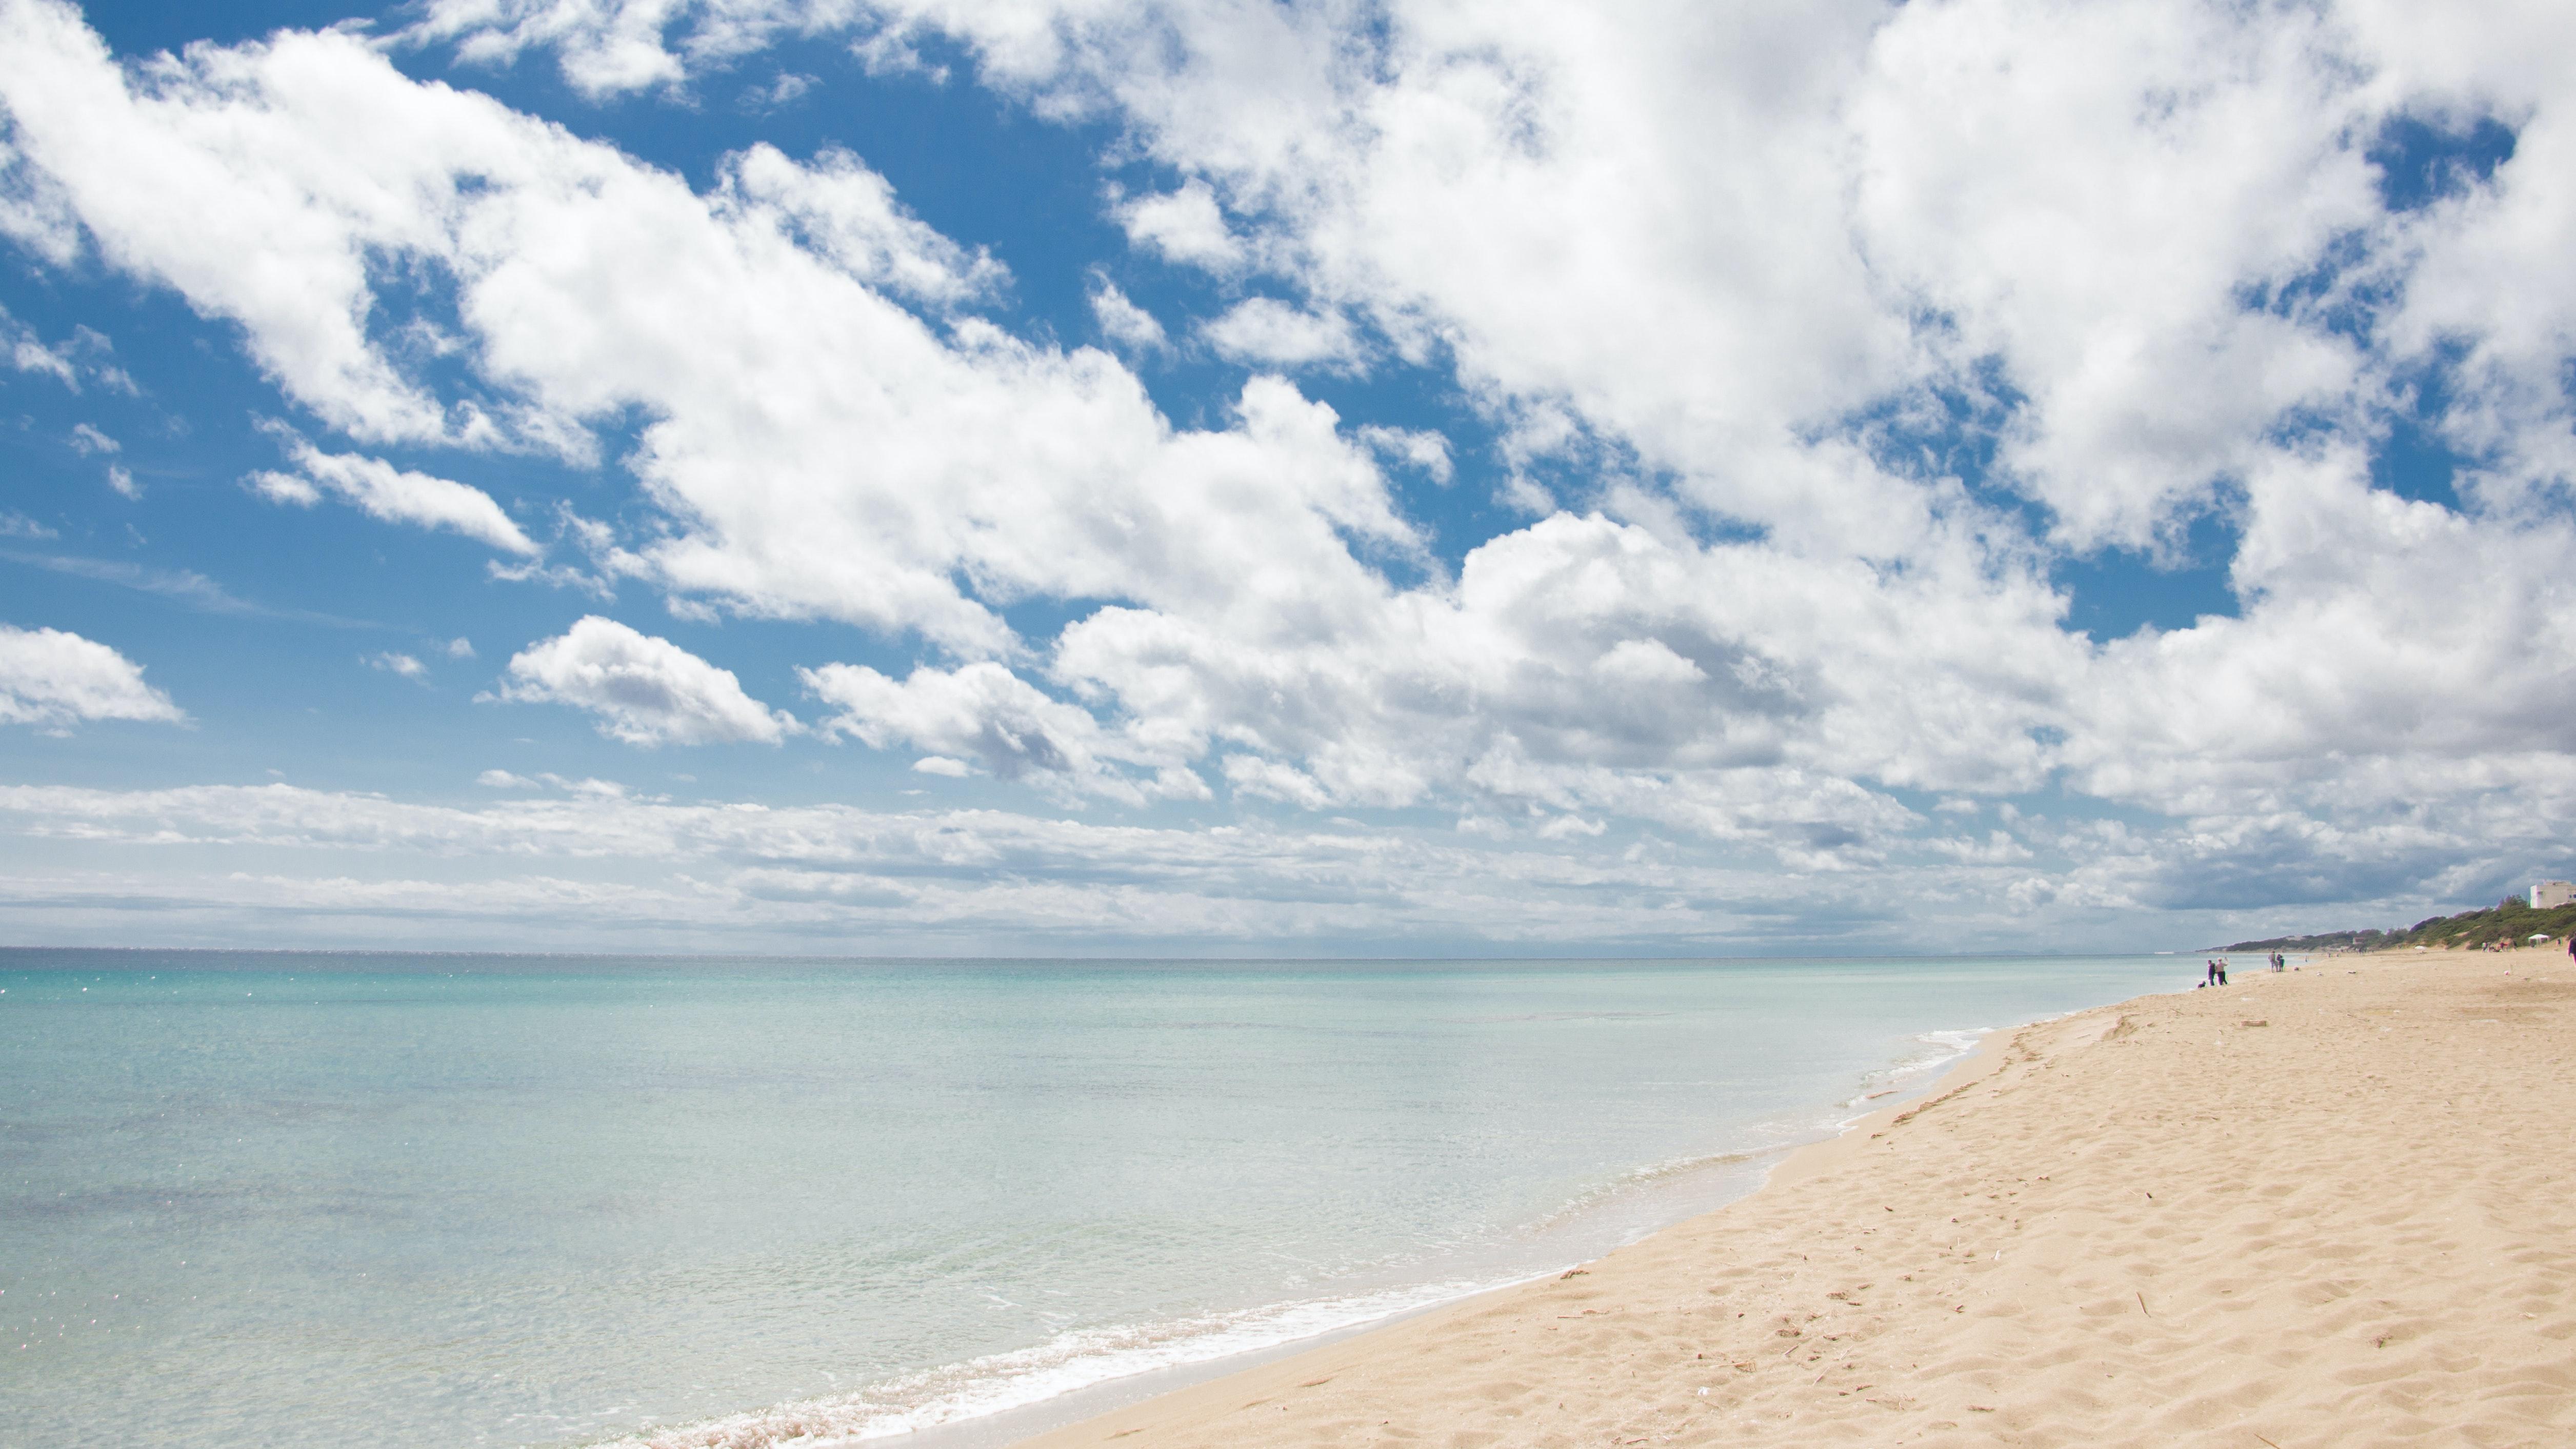 Custom Mural Wallpaper Hd Beautiful Sandy Beach Sea View: Ocean View During Daylight · Free Stock Photo